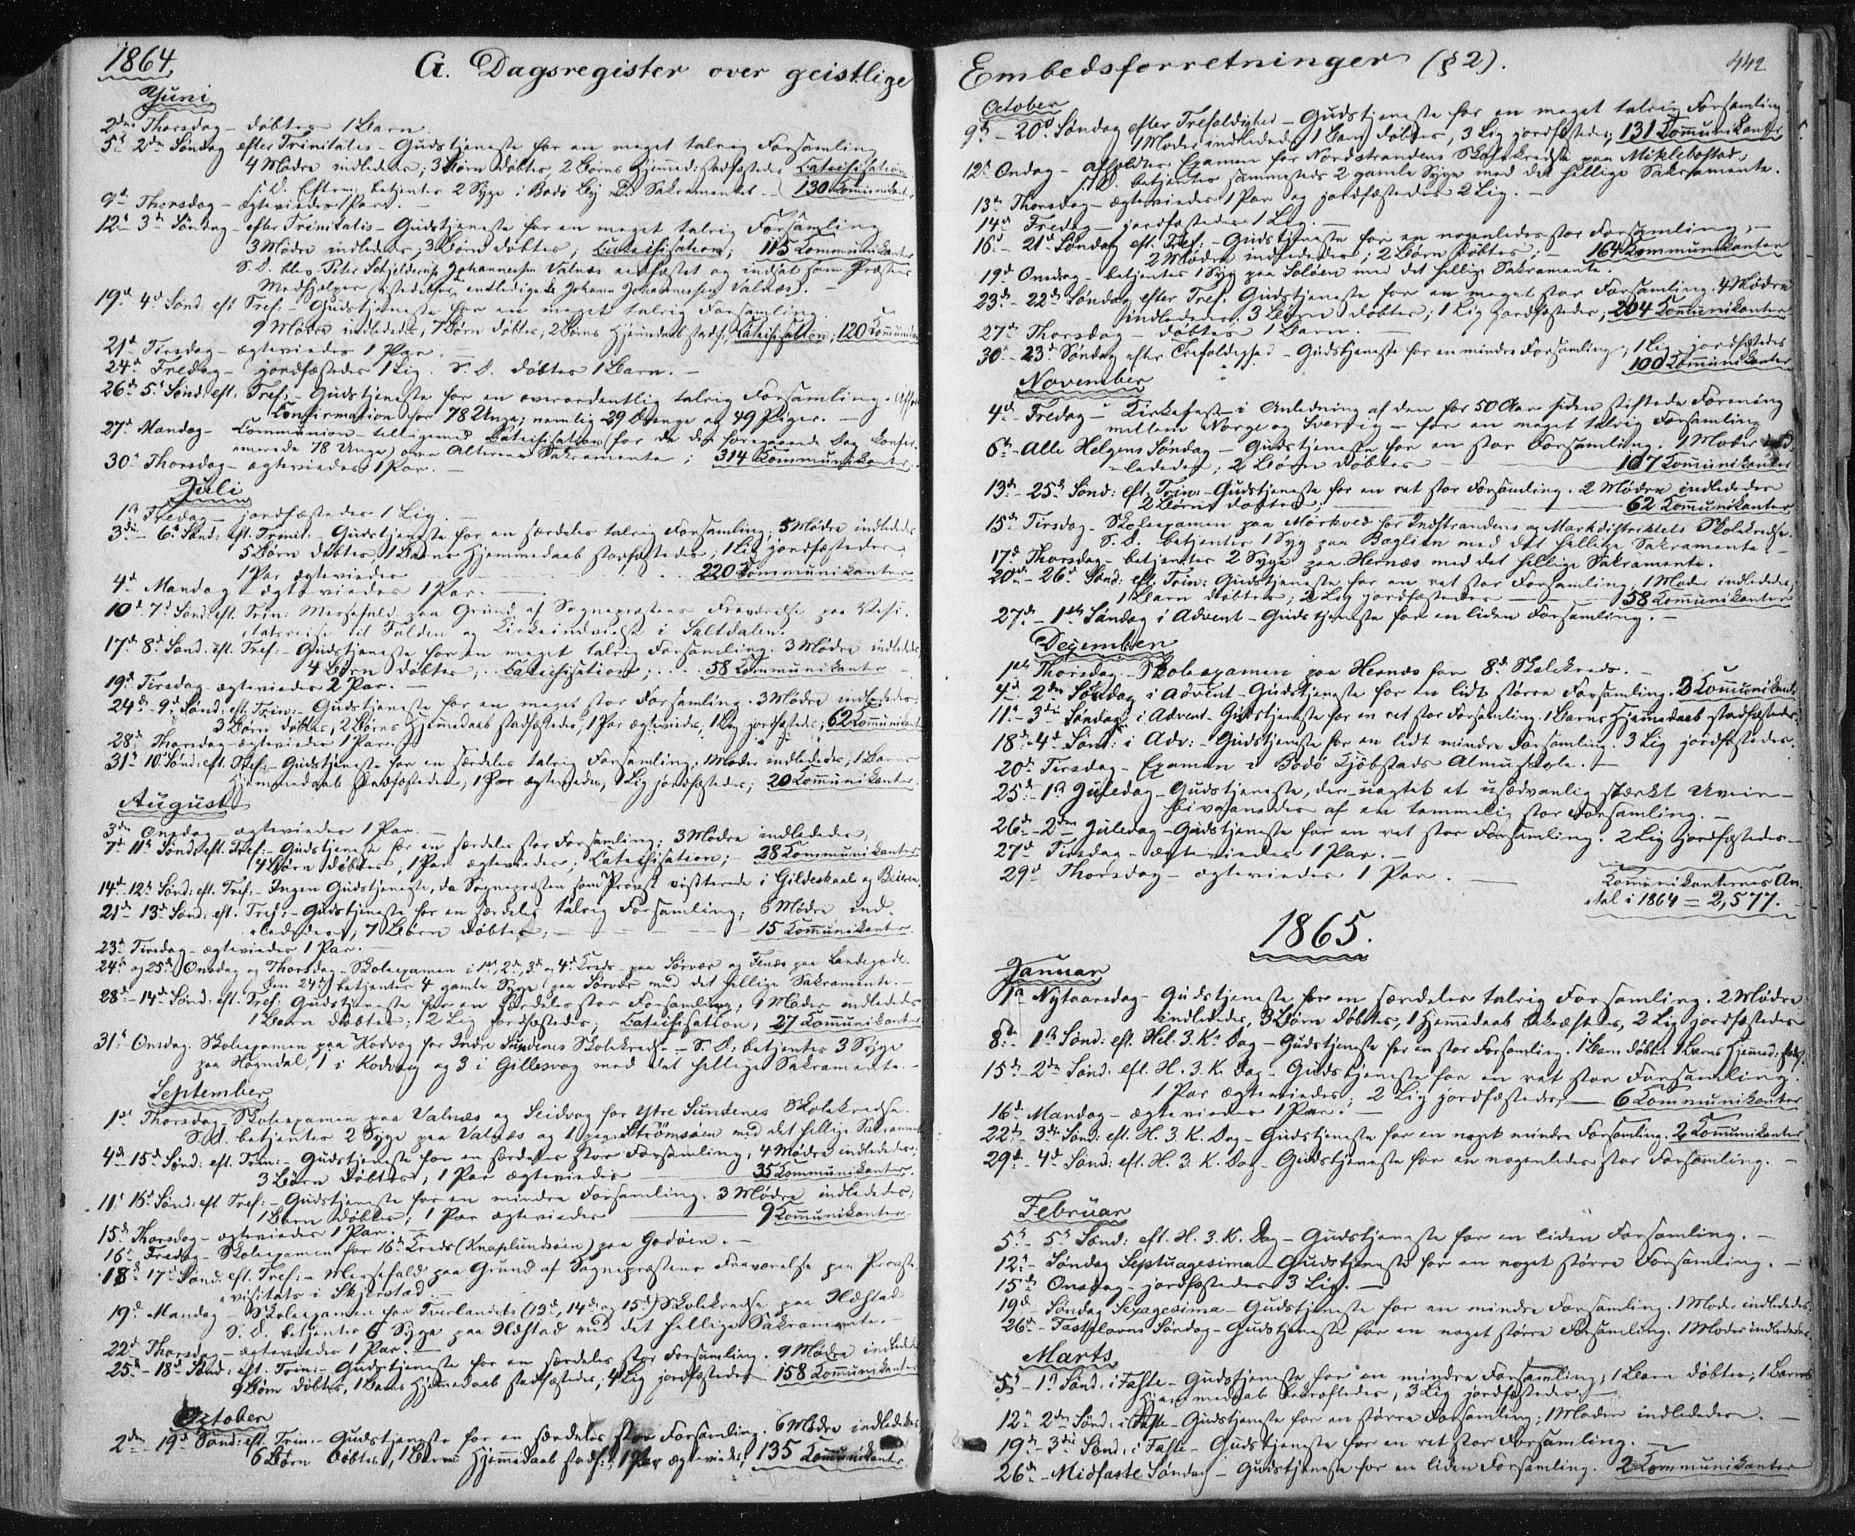 SAT, Ministerialprotokoller, klokkerbøker og fødselsregistre - Nordland, 801/L0008: Ministerialbok nr. 801A08, 1864-1875, s. 442